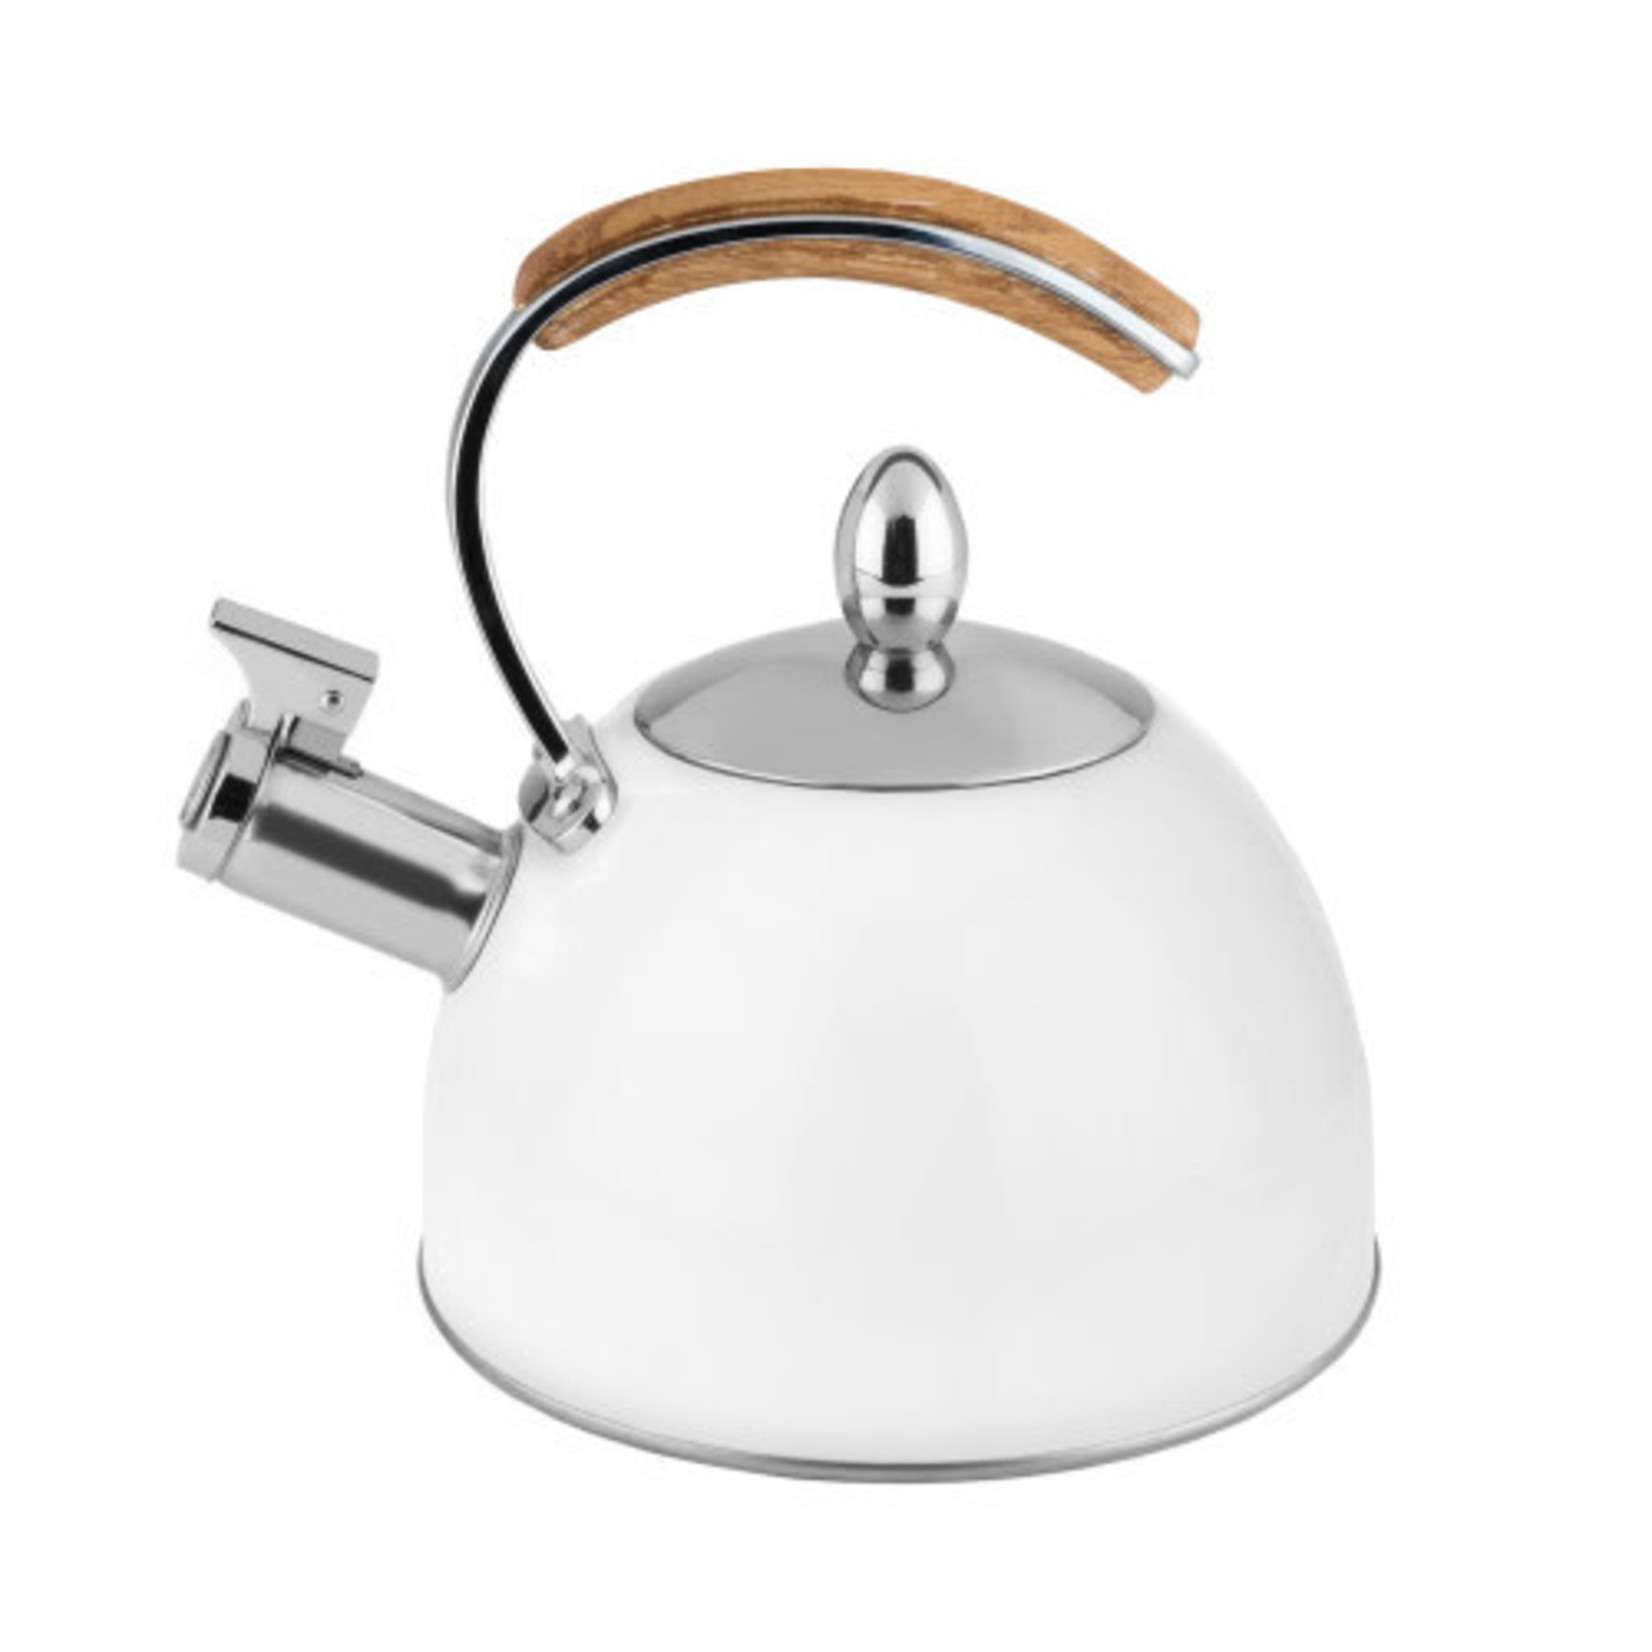 Presley White Tea Kettle